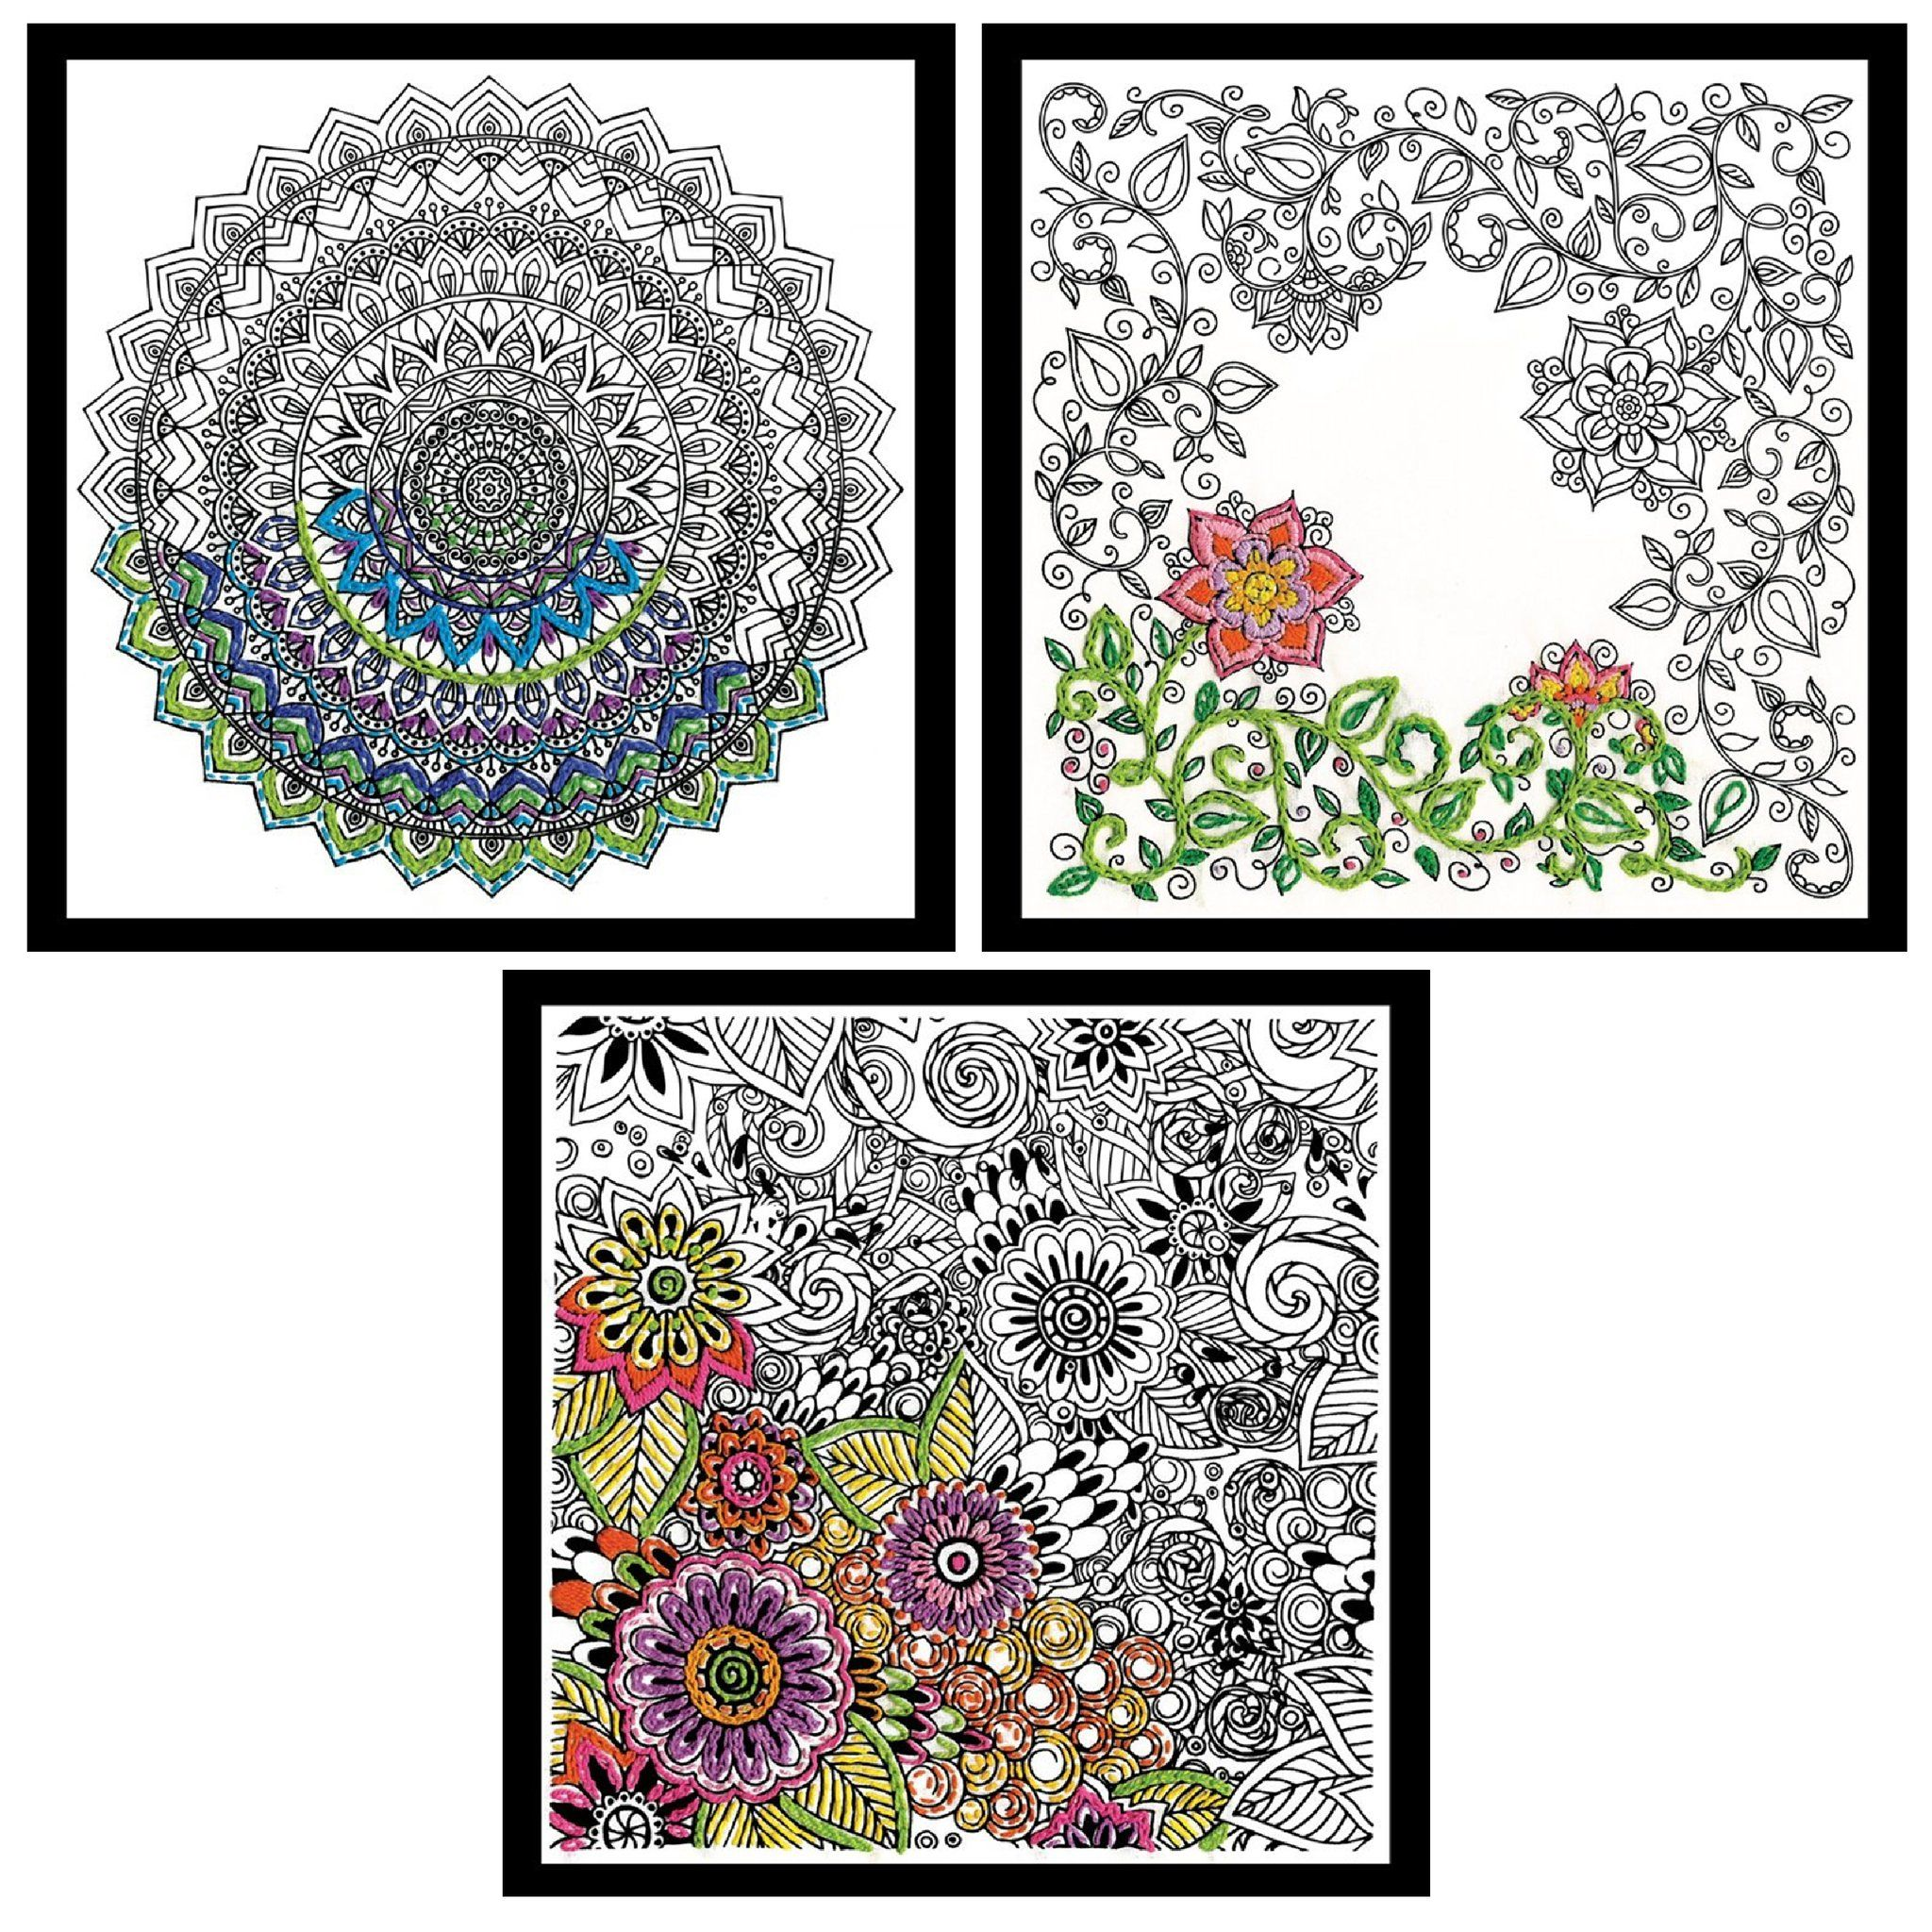 Tobin 4011 10 x 10 Garden Zenbroidery Stamped Embroidery